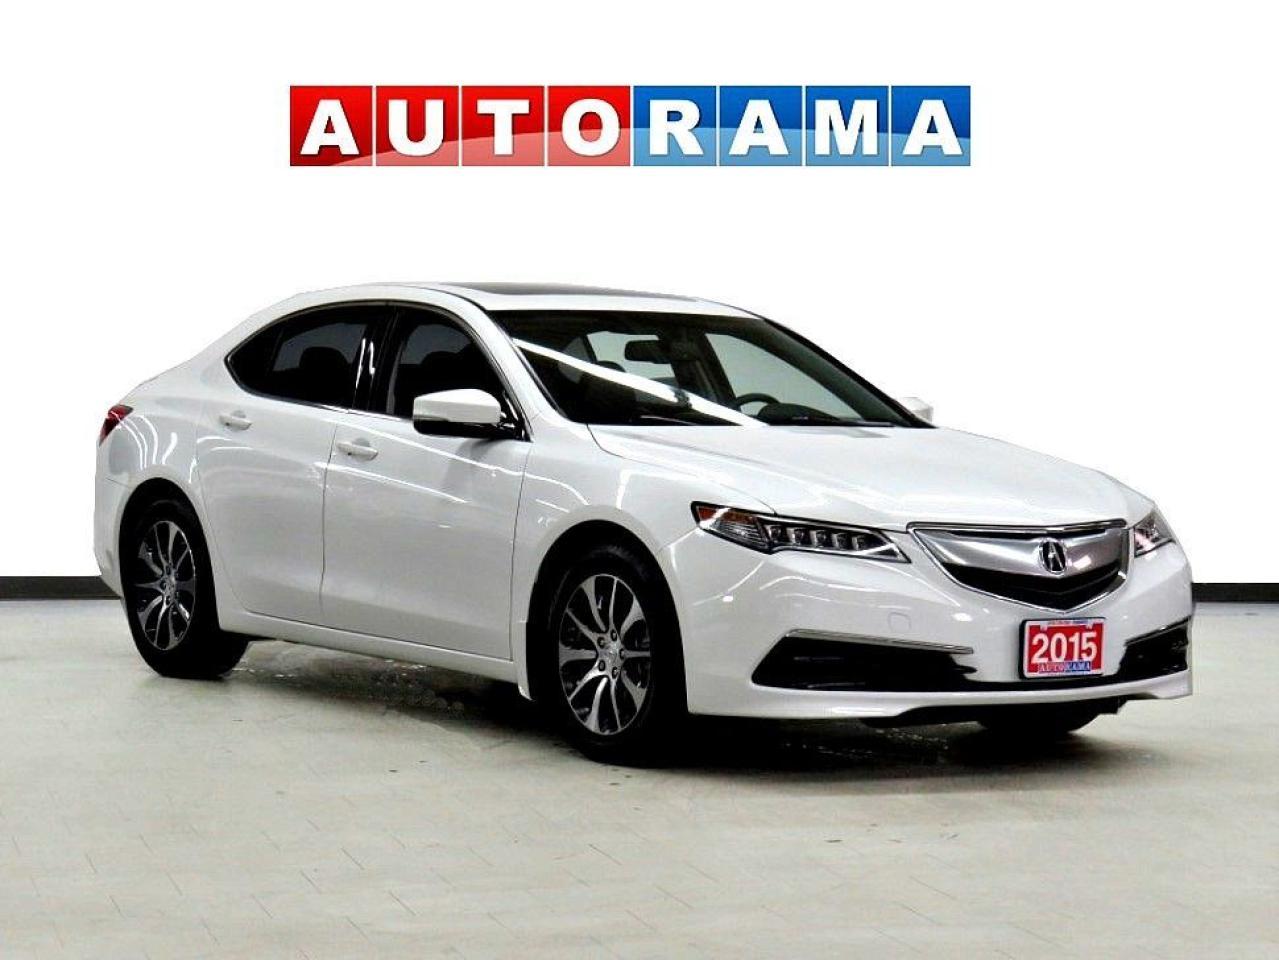 2015 Acura TLX LEATHER SUNROOF BACK UP CAMERA